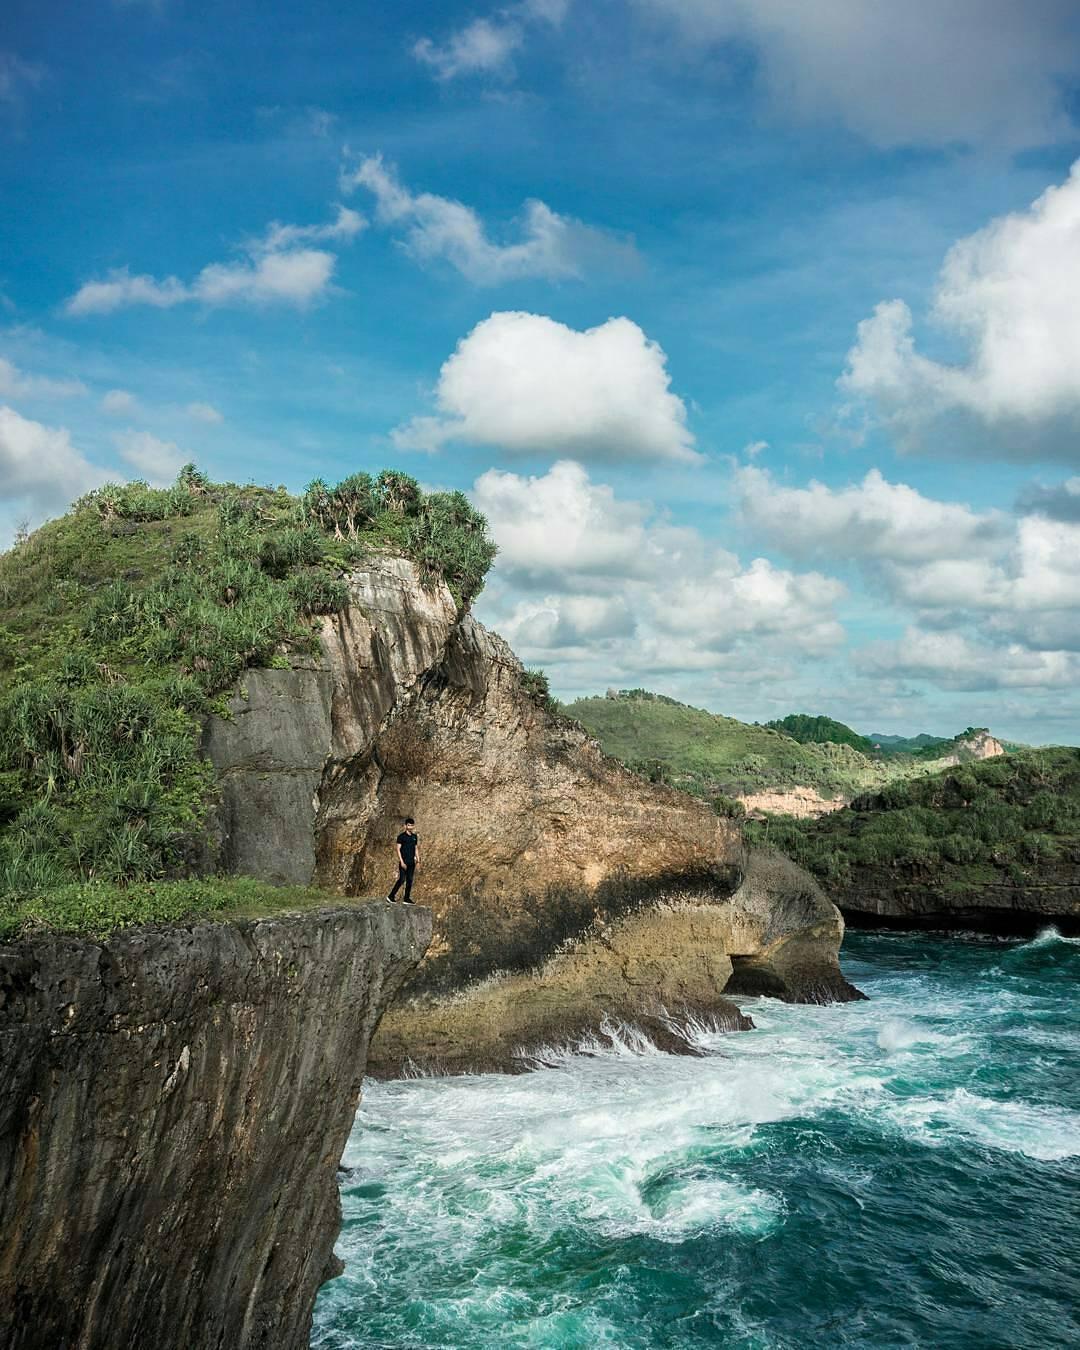 Pantai Njanganan, Pantai Njanganan Yogyakarta, Yogyakarta, Dolan Dolen, Dolaners